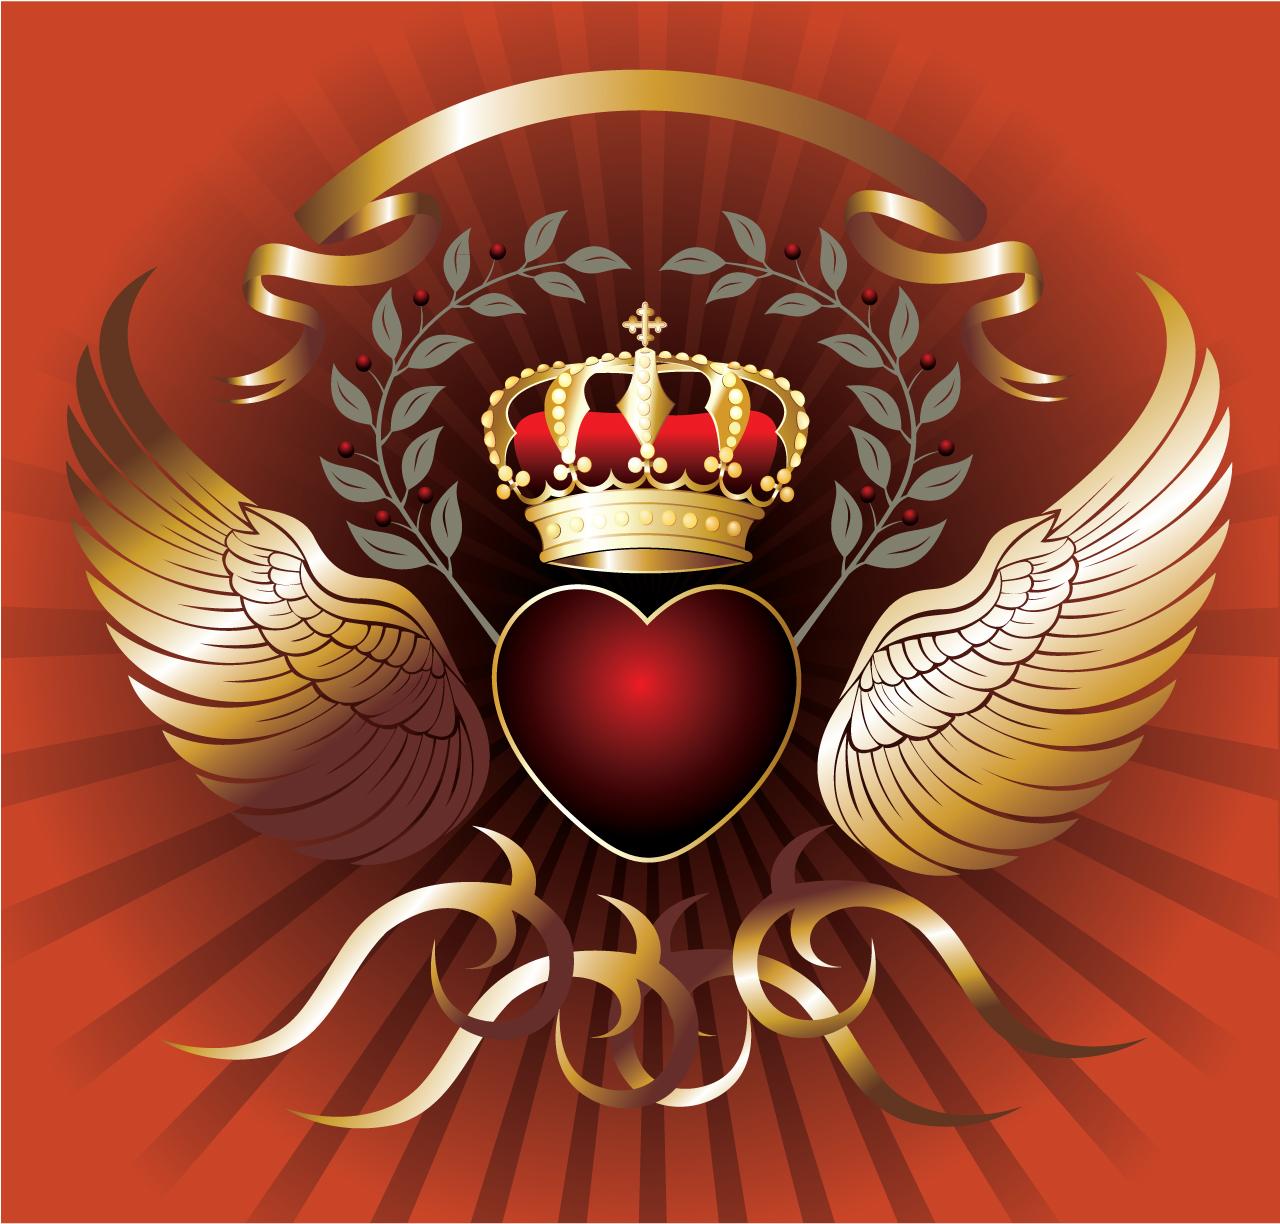 King crown wallpaper - photo#20